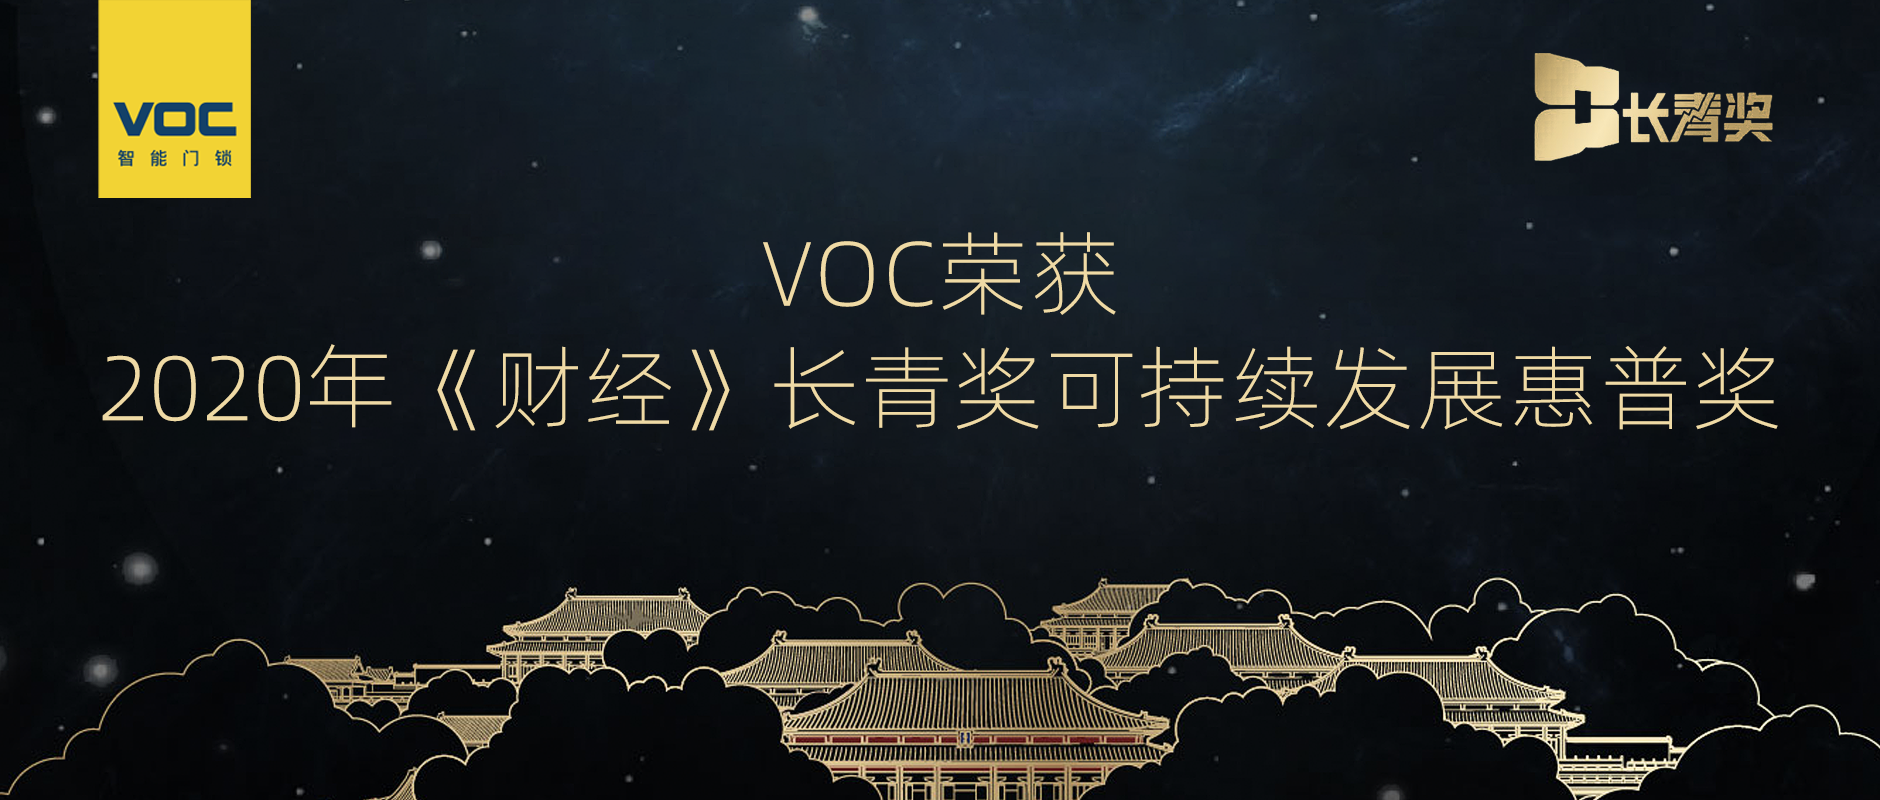 "AIoT硬科技可持续发展获认可,VOC摘得2020《财经》长青奖""可持续发展普惠奖"""